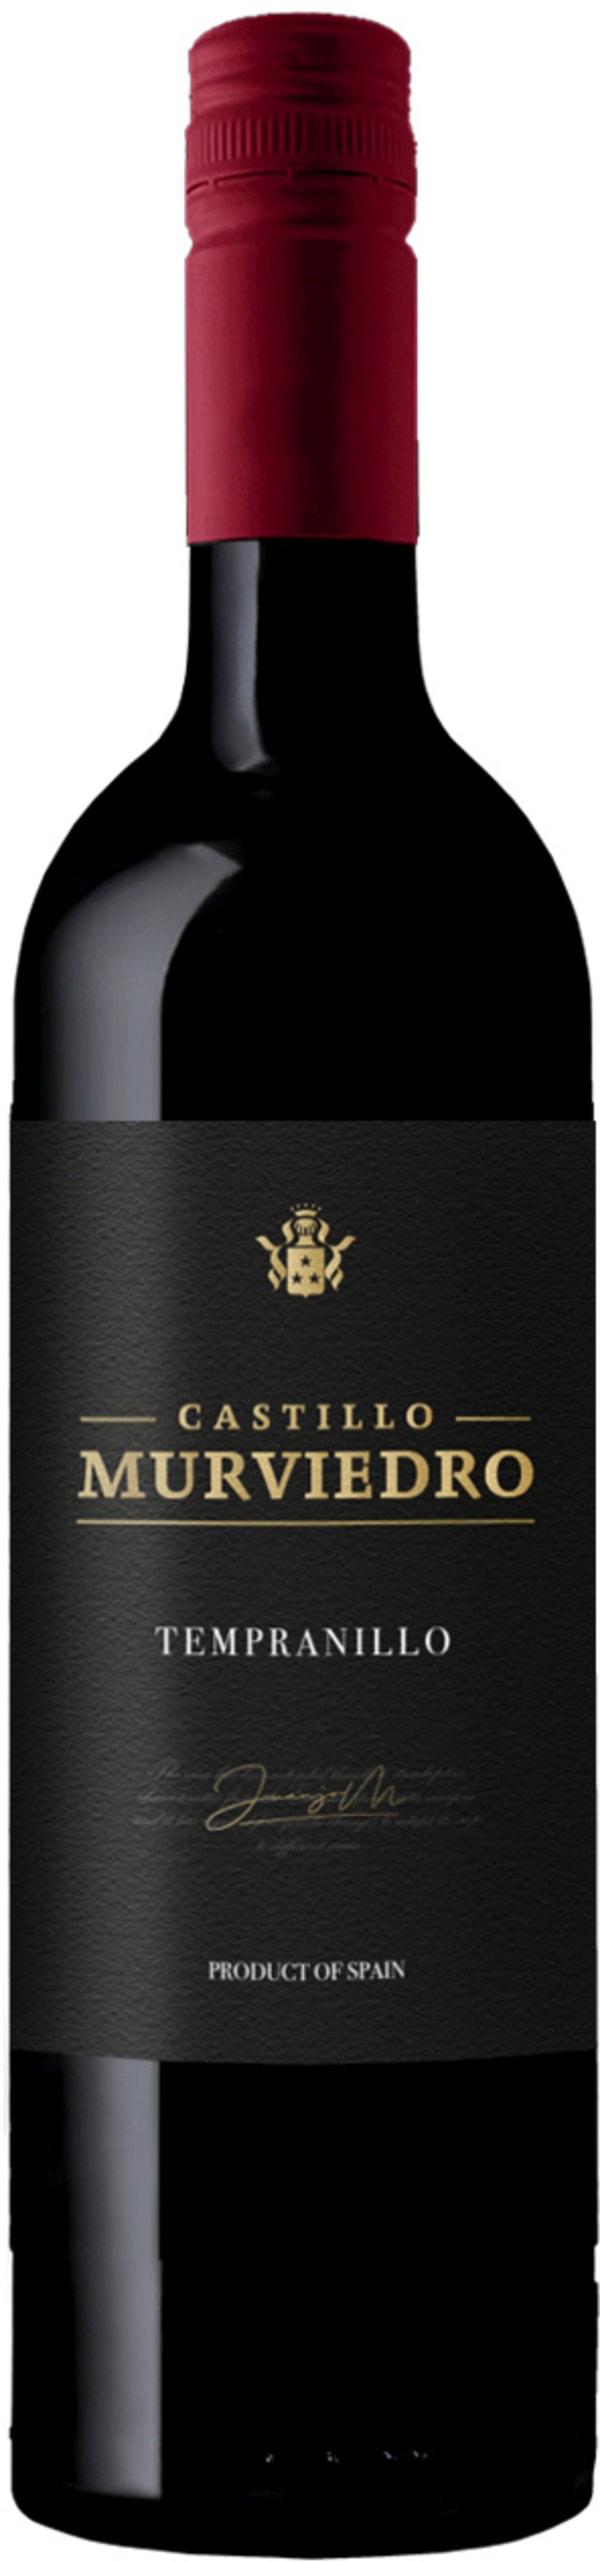 Castillo Murviedro Tempranillo 2017